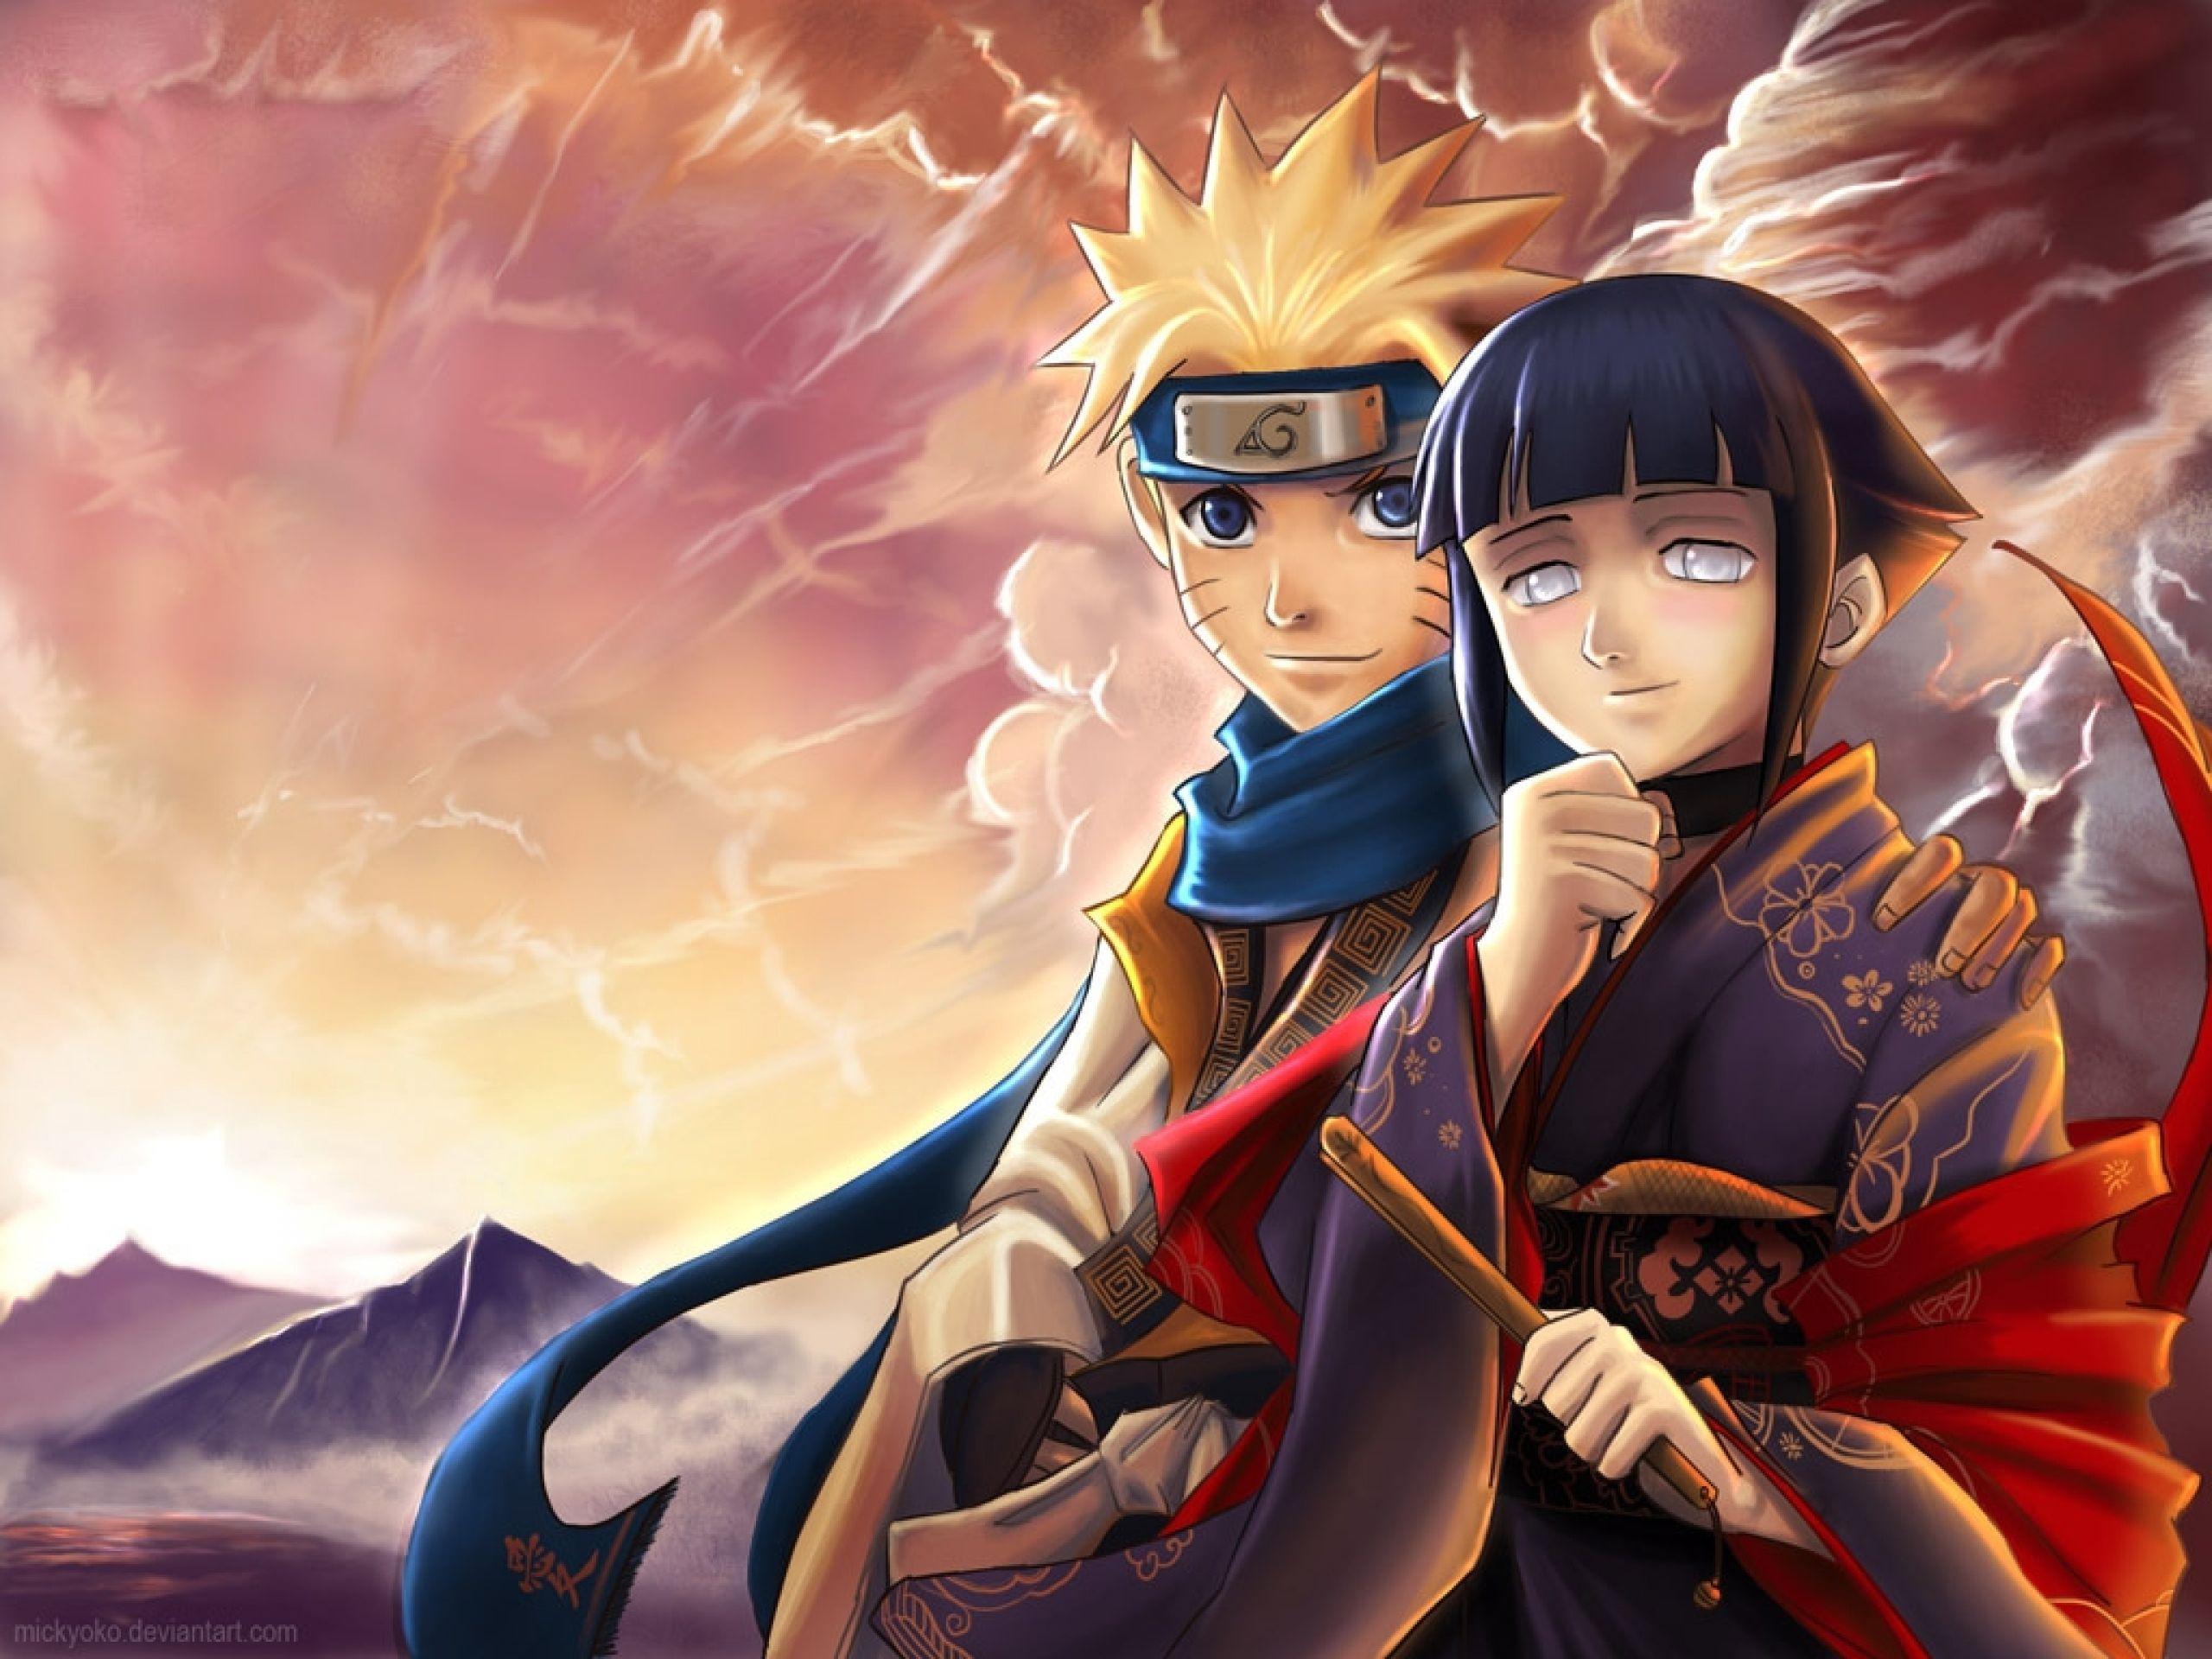 Download Wallpapers Download 2560x1920 Naruto Shippuden Hyuuga